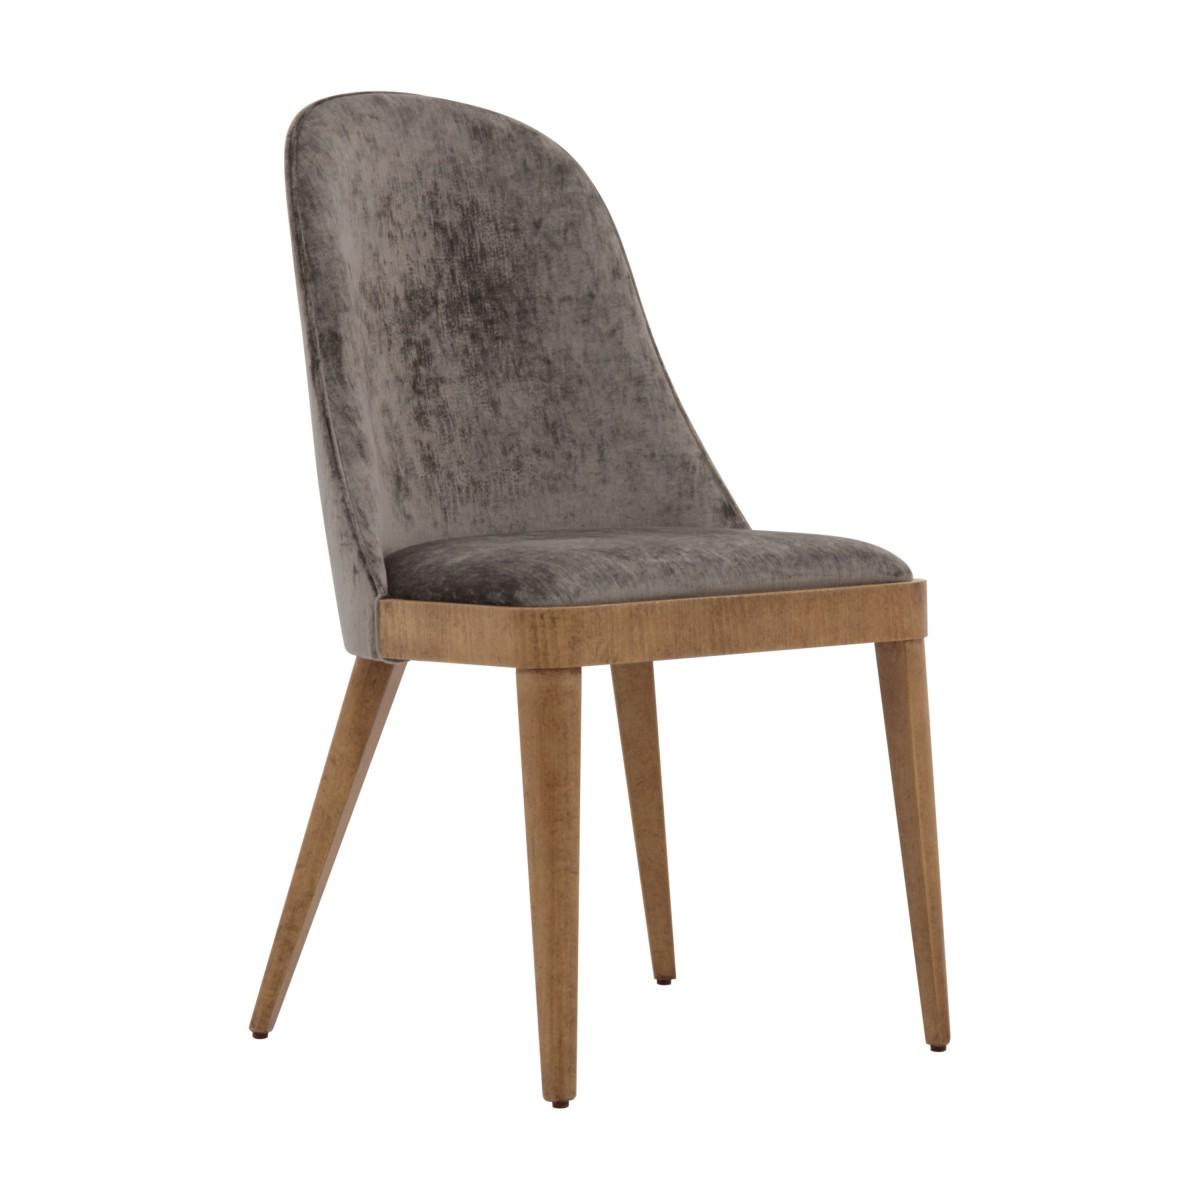 italian modern chair svezia 3 2921